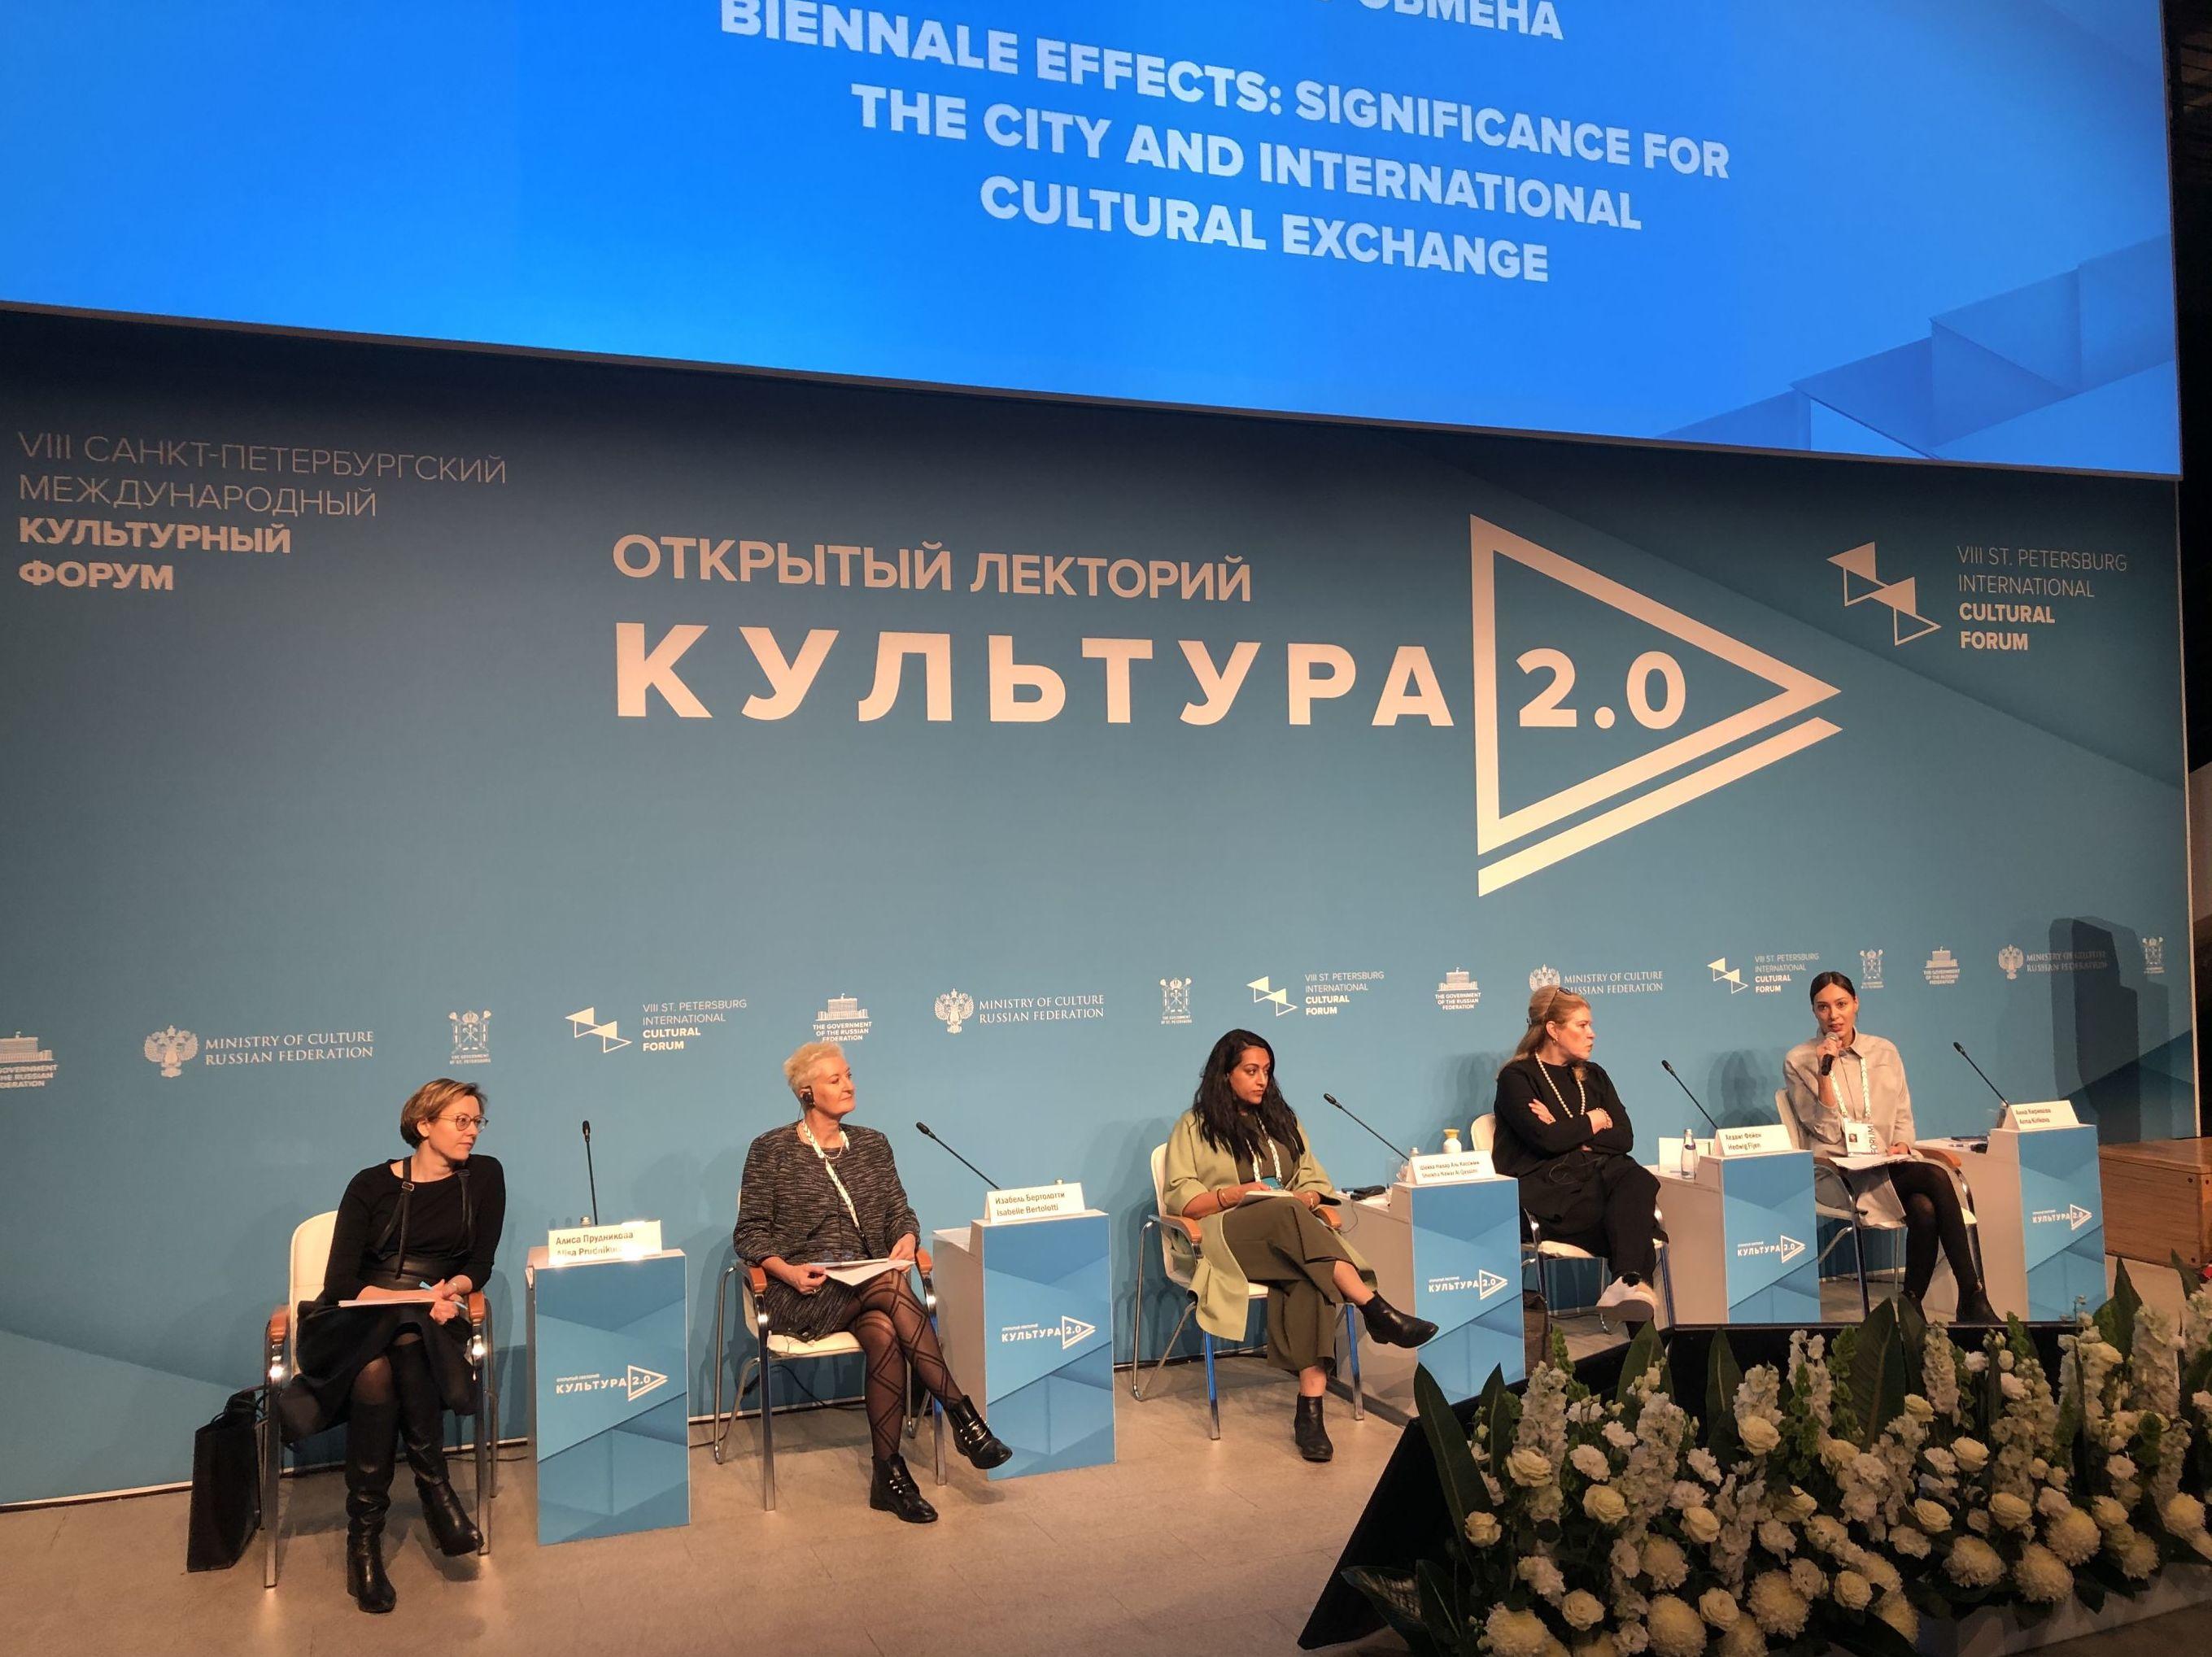 Forum culturel international de Saint-Pétersbourg